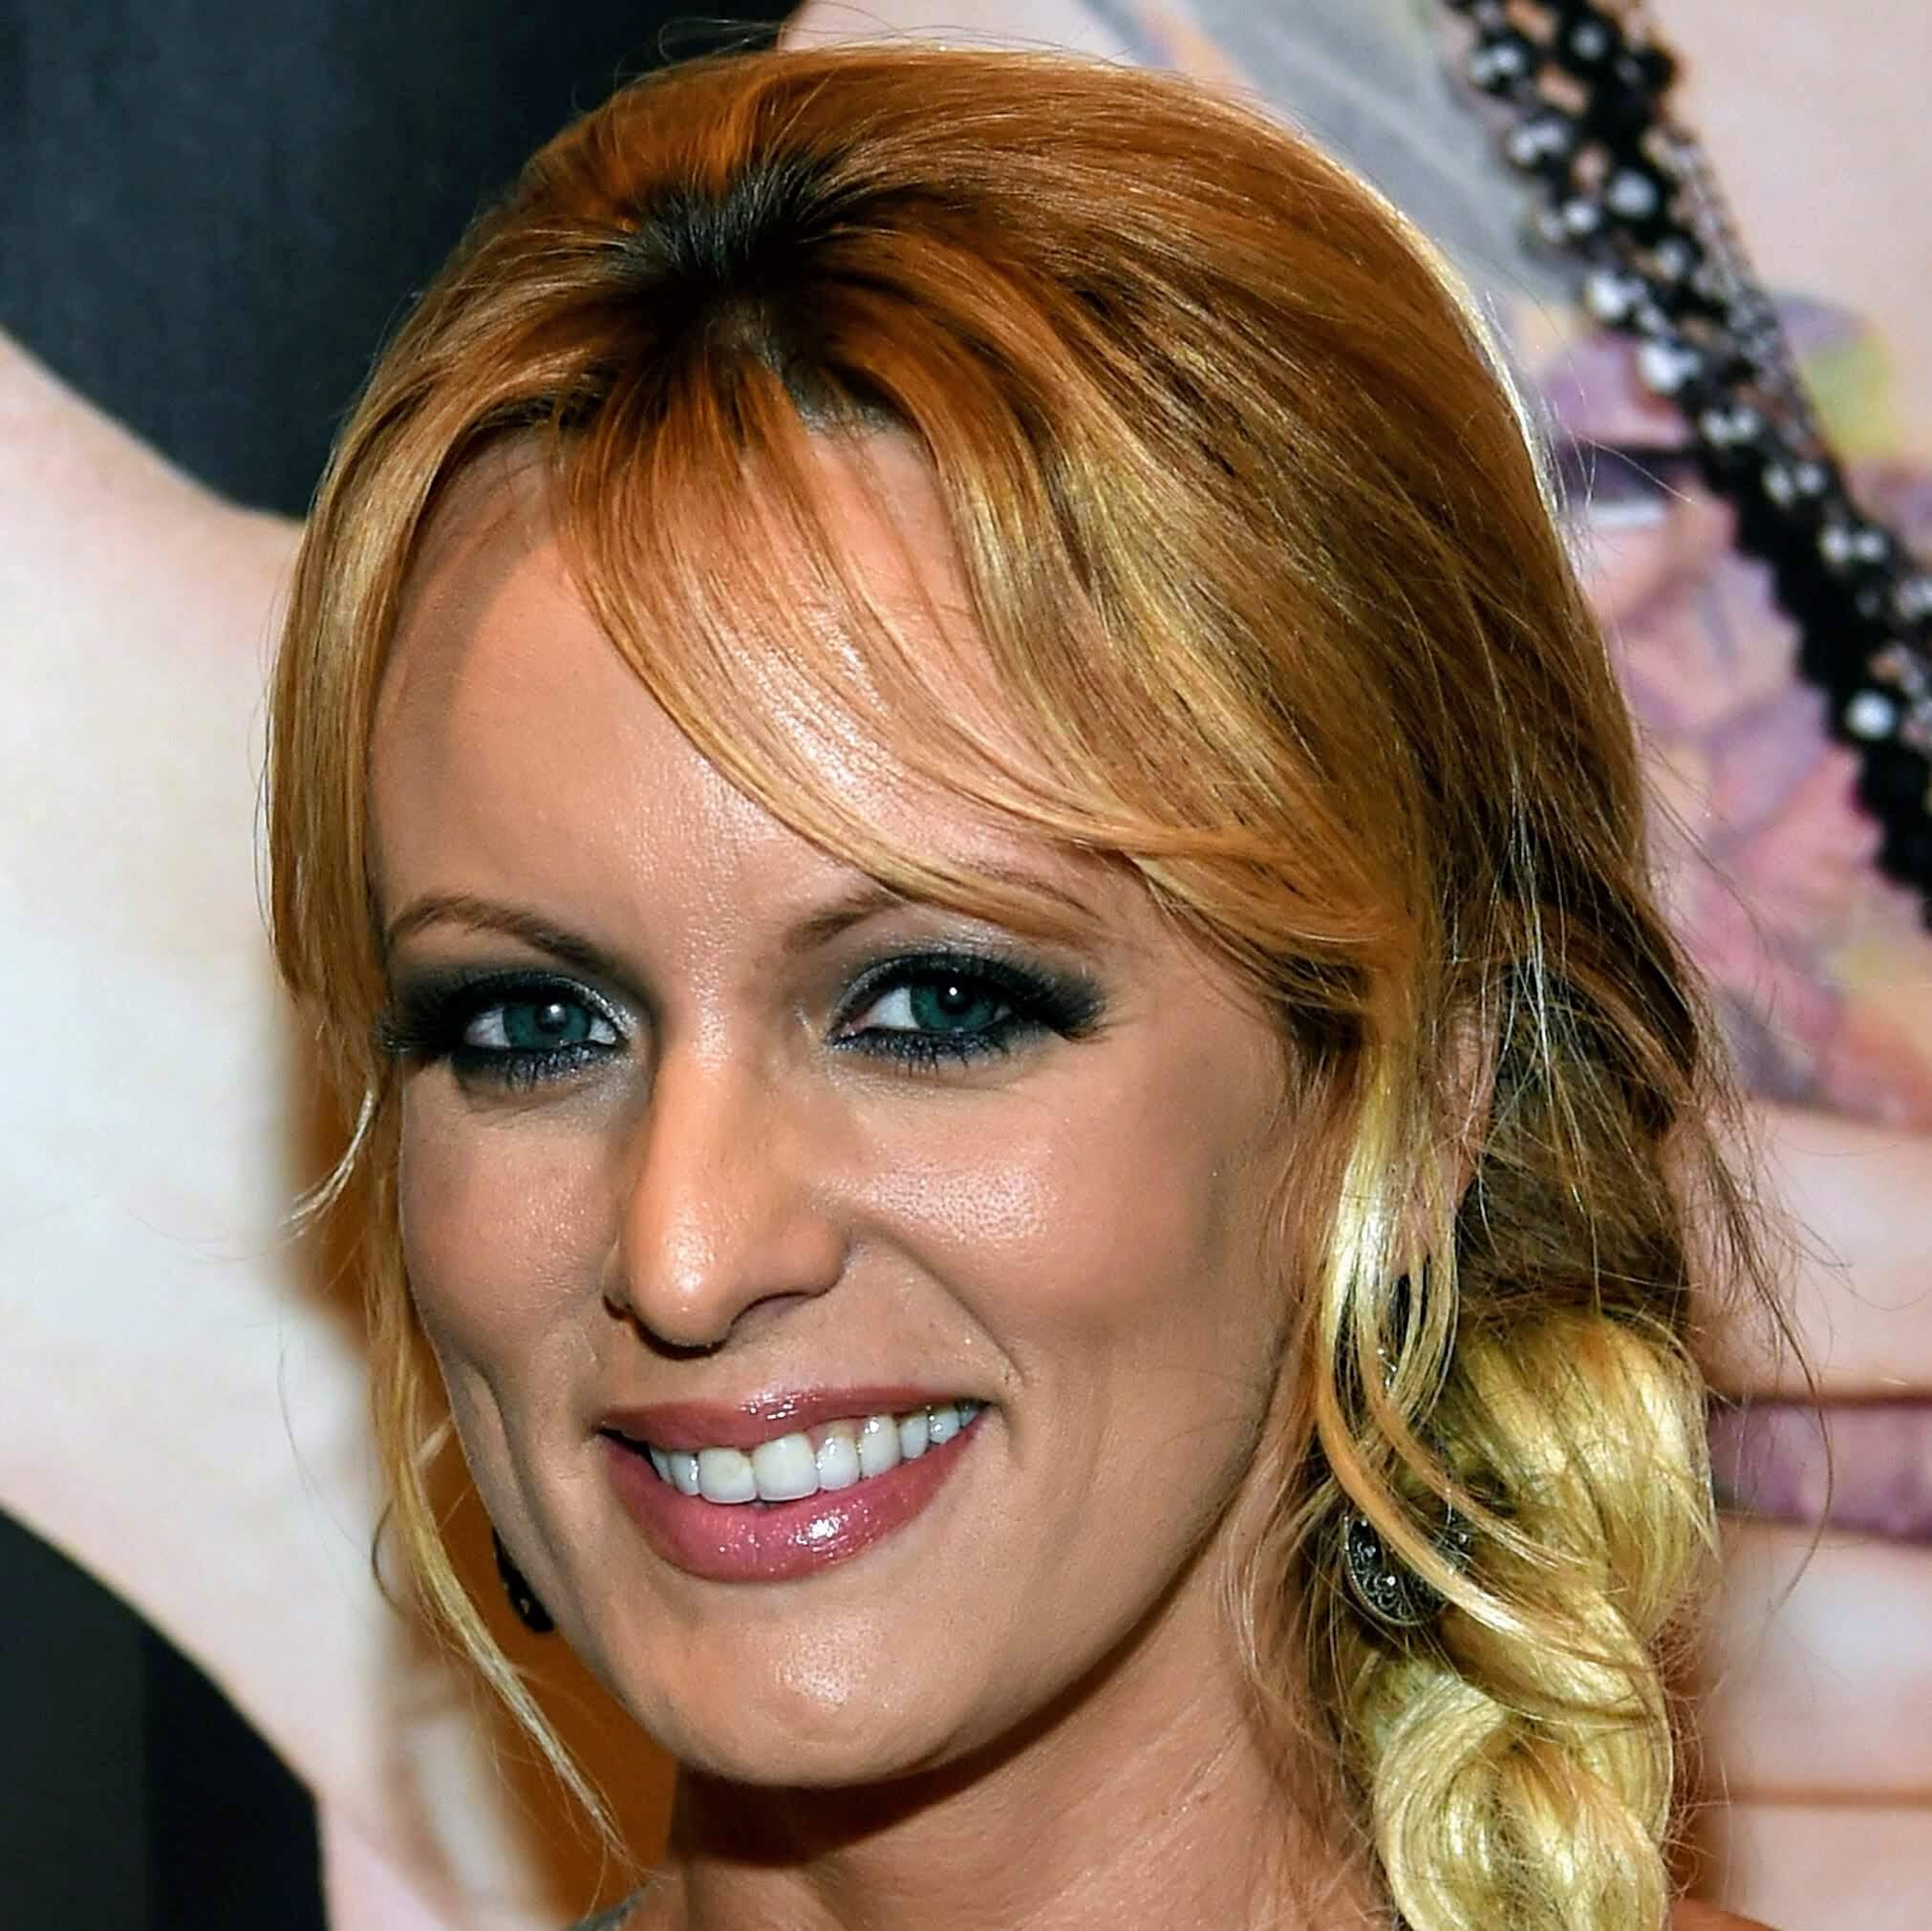 Adult film actress Stormy Daniels